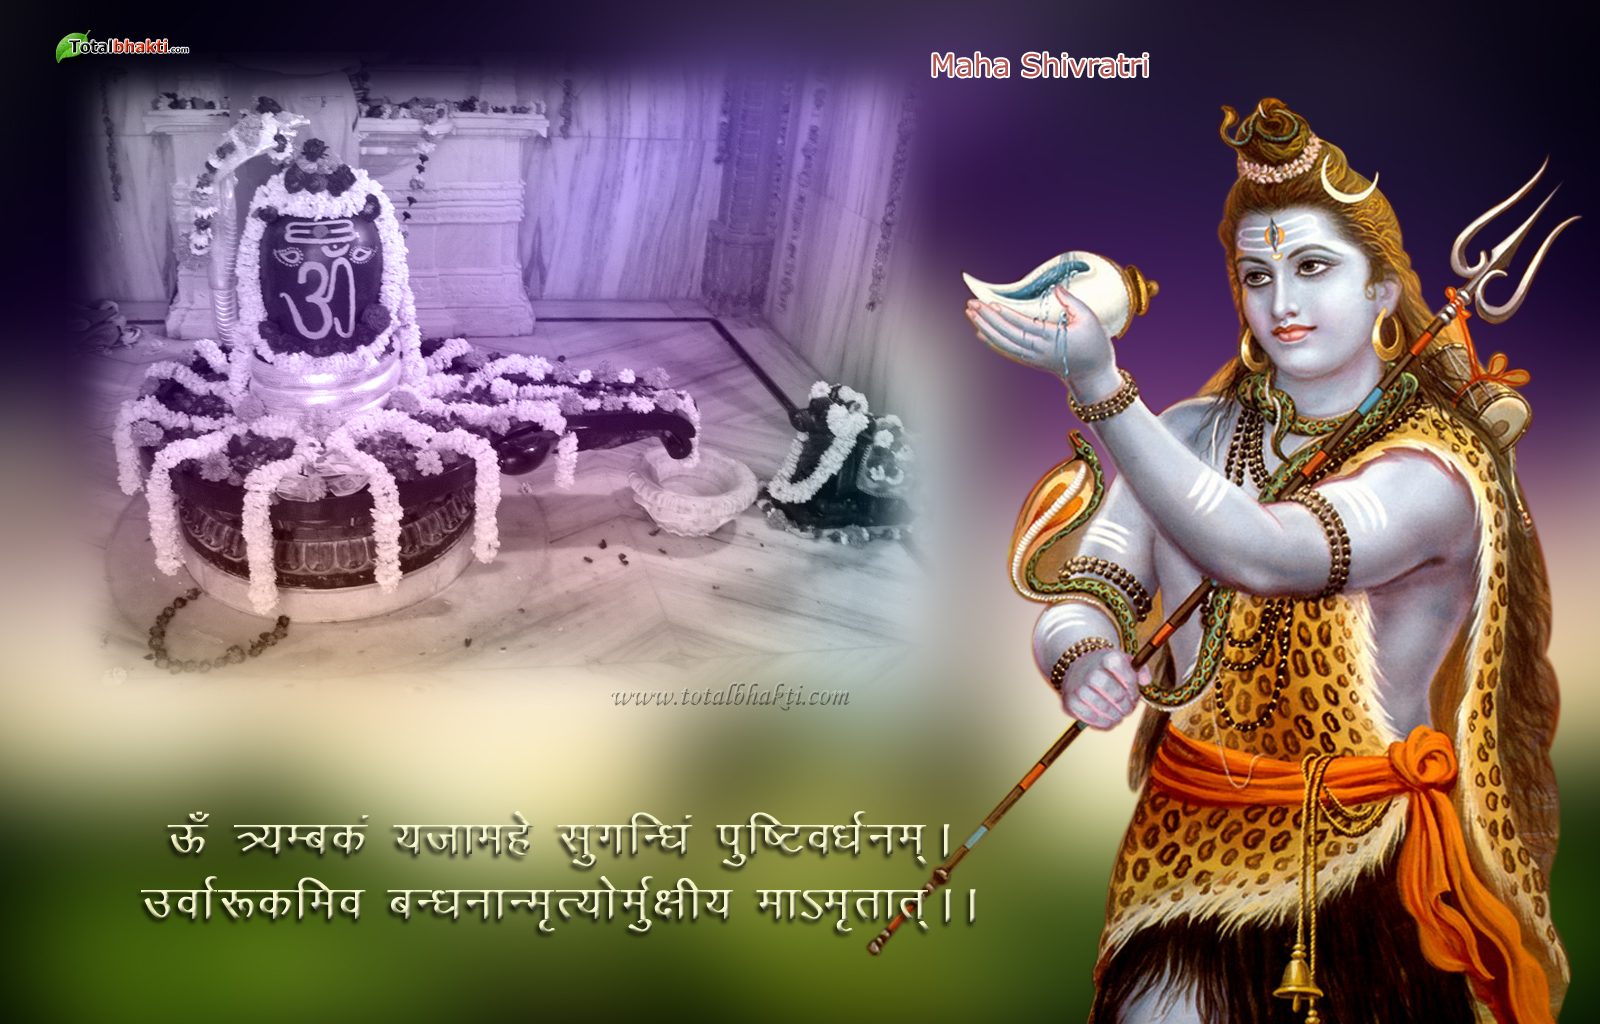 http://4.bp.blogspot.com/-YFFnbfLdMKQ/Tvt3HltgSrI/AAAAAAAADKU/GIZSI3p1G_Q/s1600/Maha-Shivratri-3427.jpg